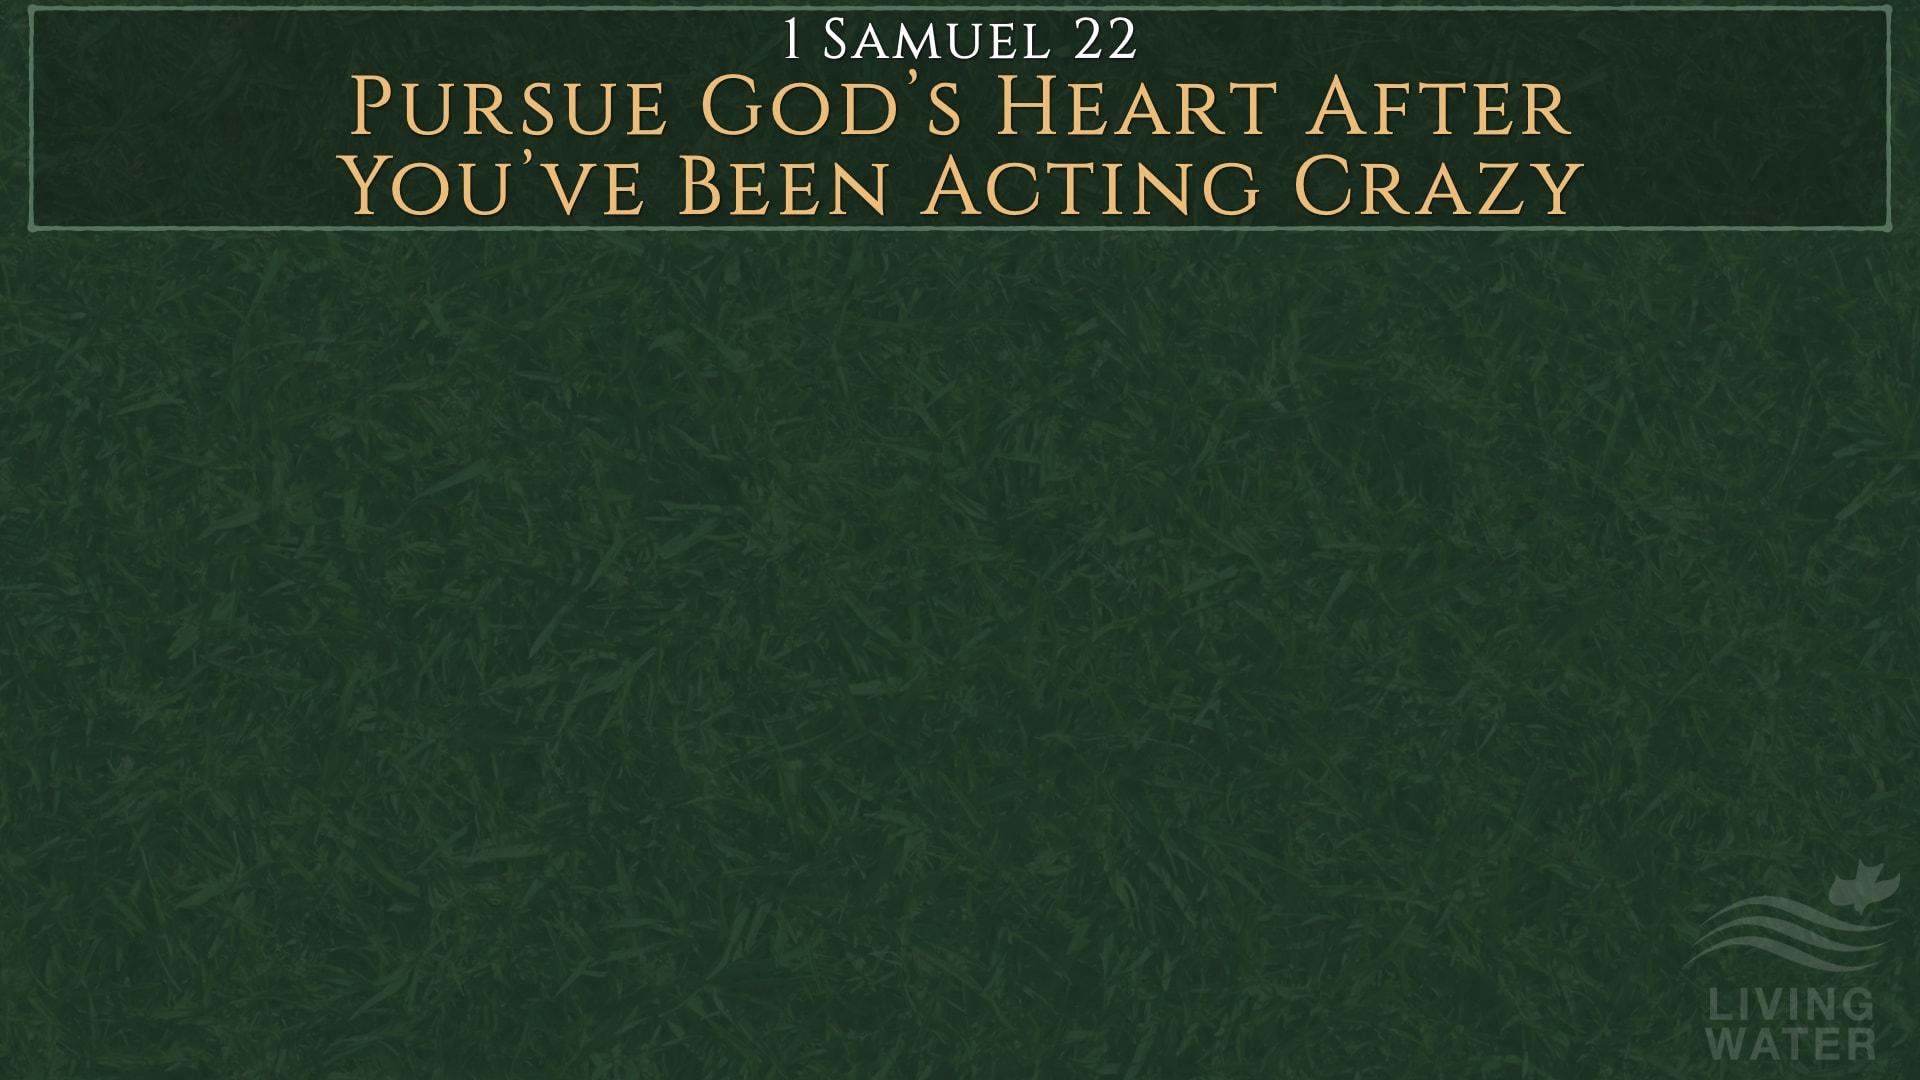 1 Samuel 22, Pursue God's Heart After You've Been Acting Crazy